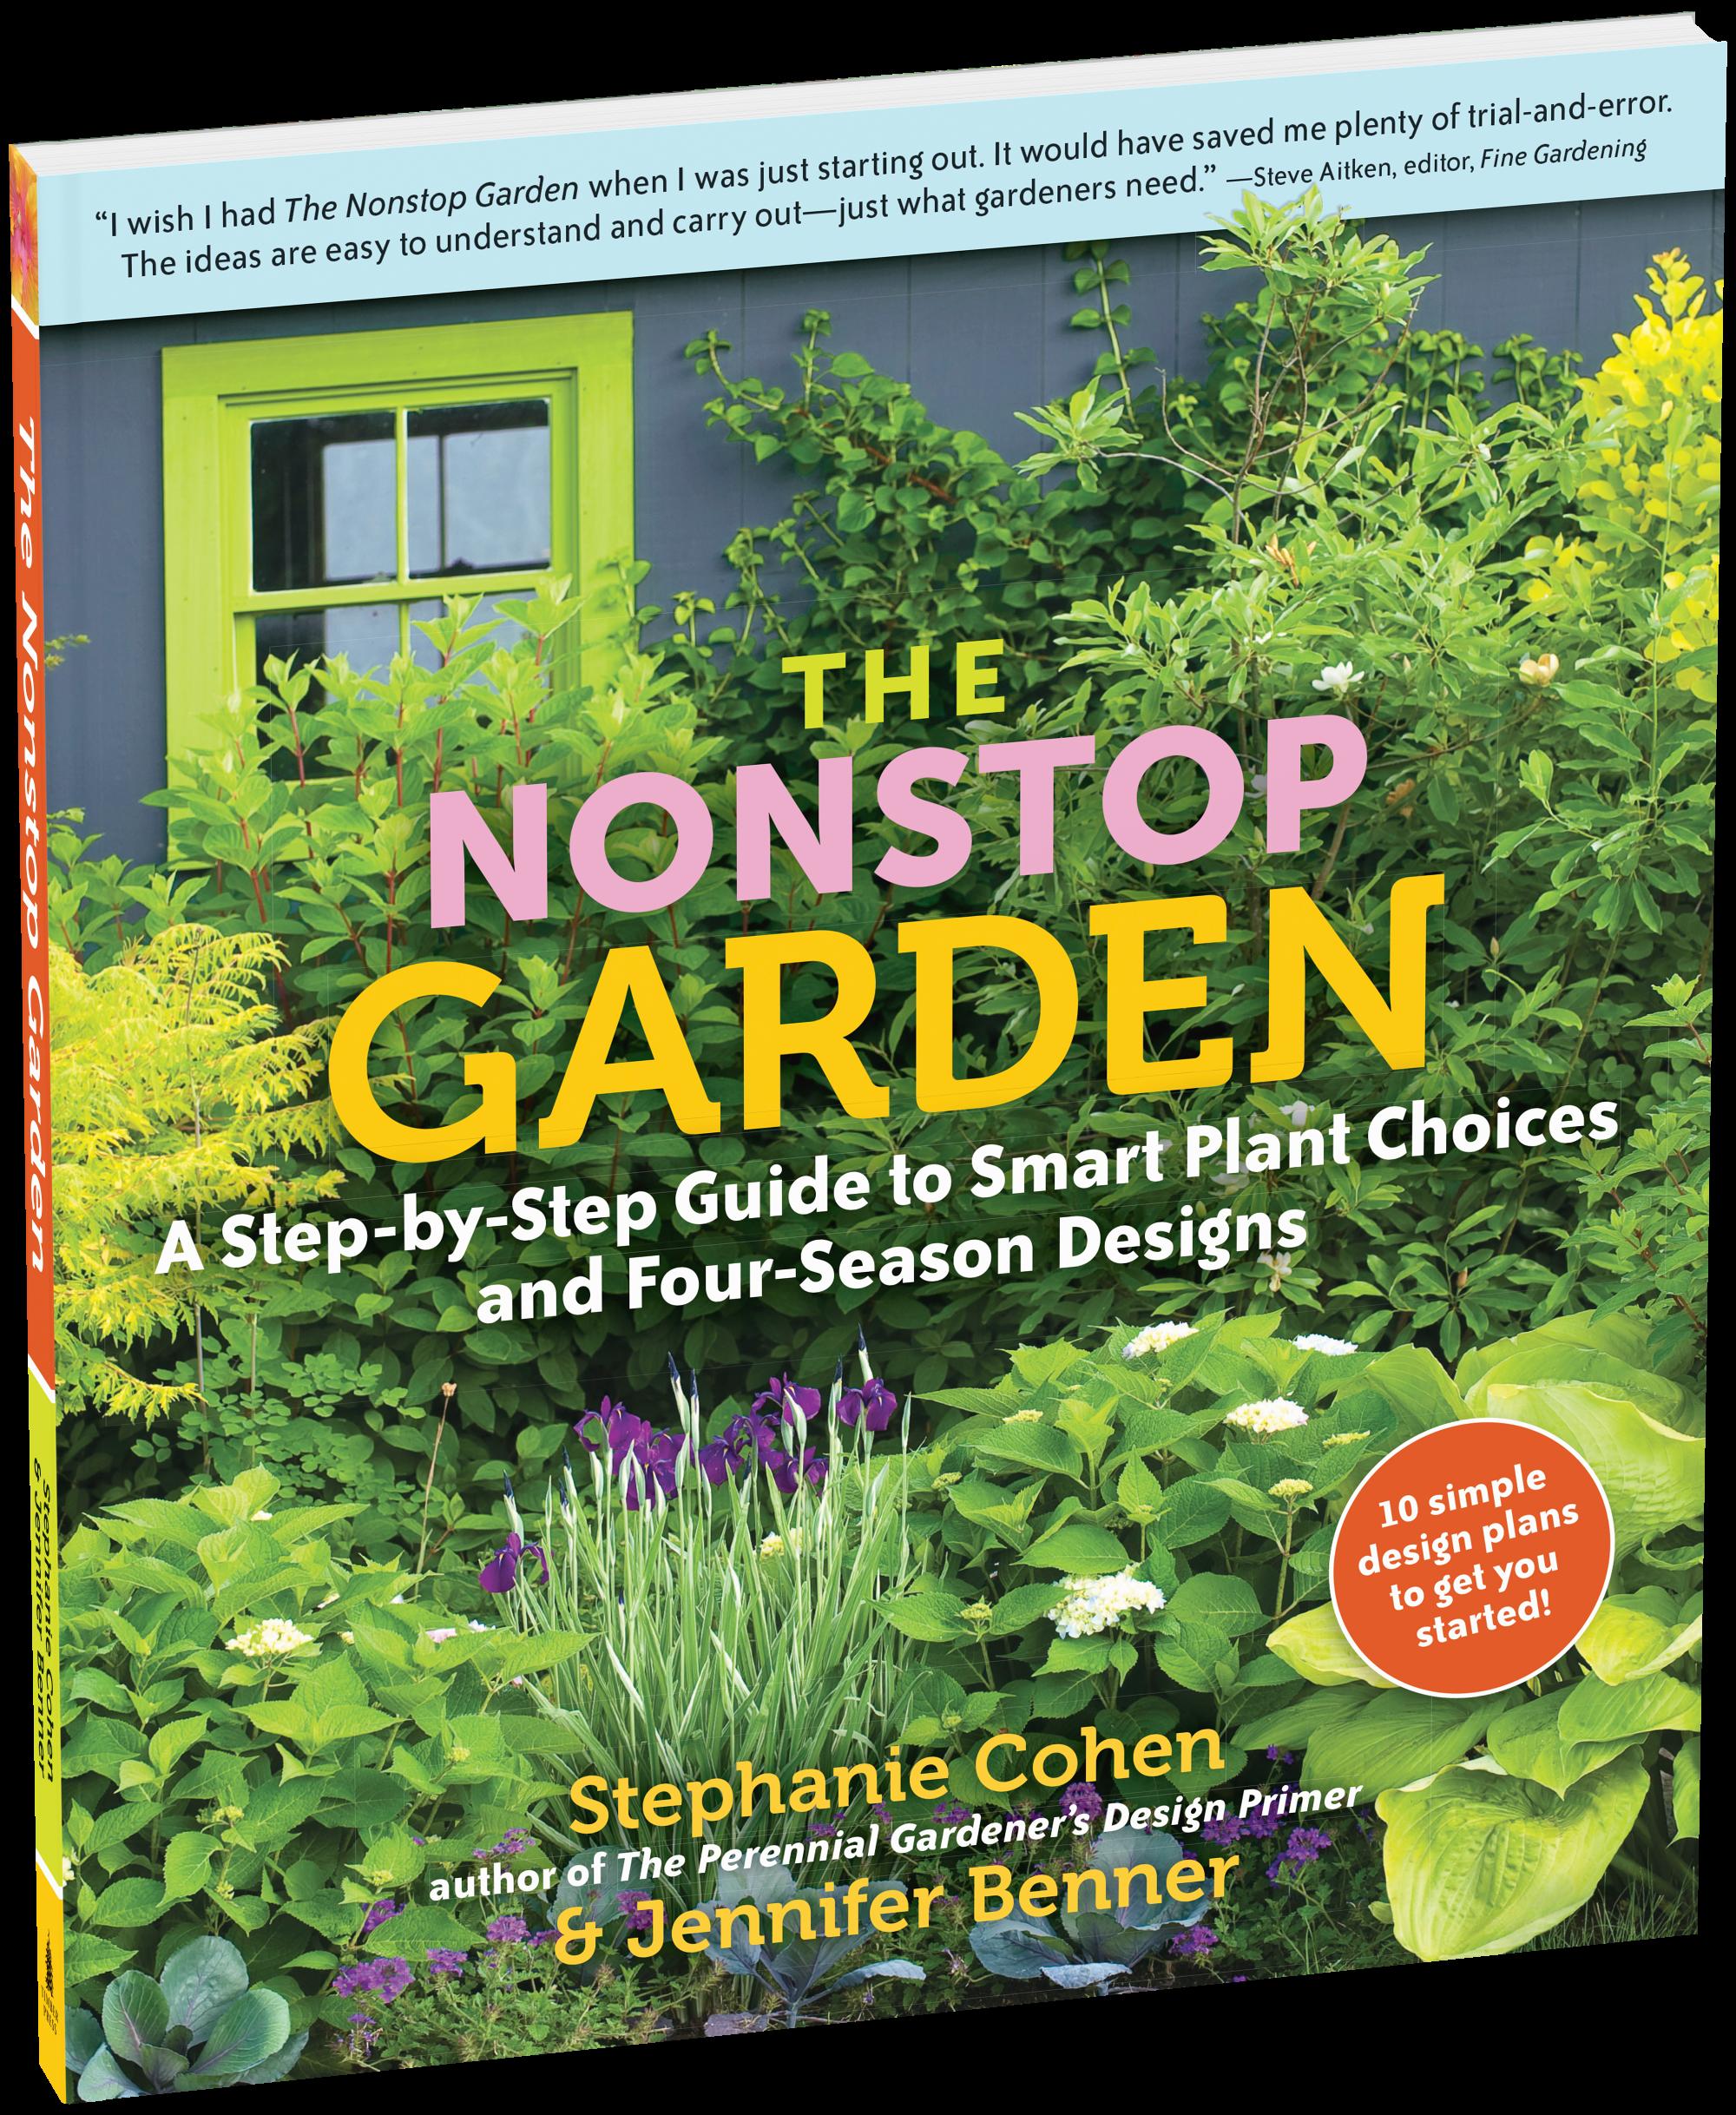 The Nonstop Garden